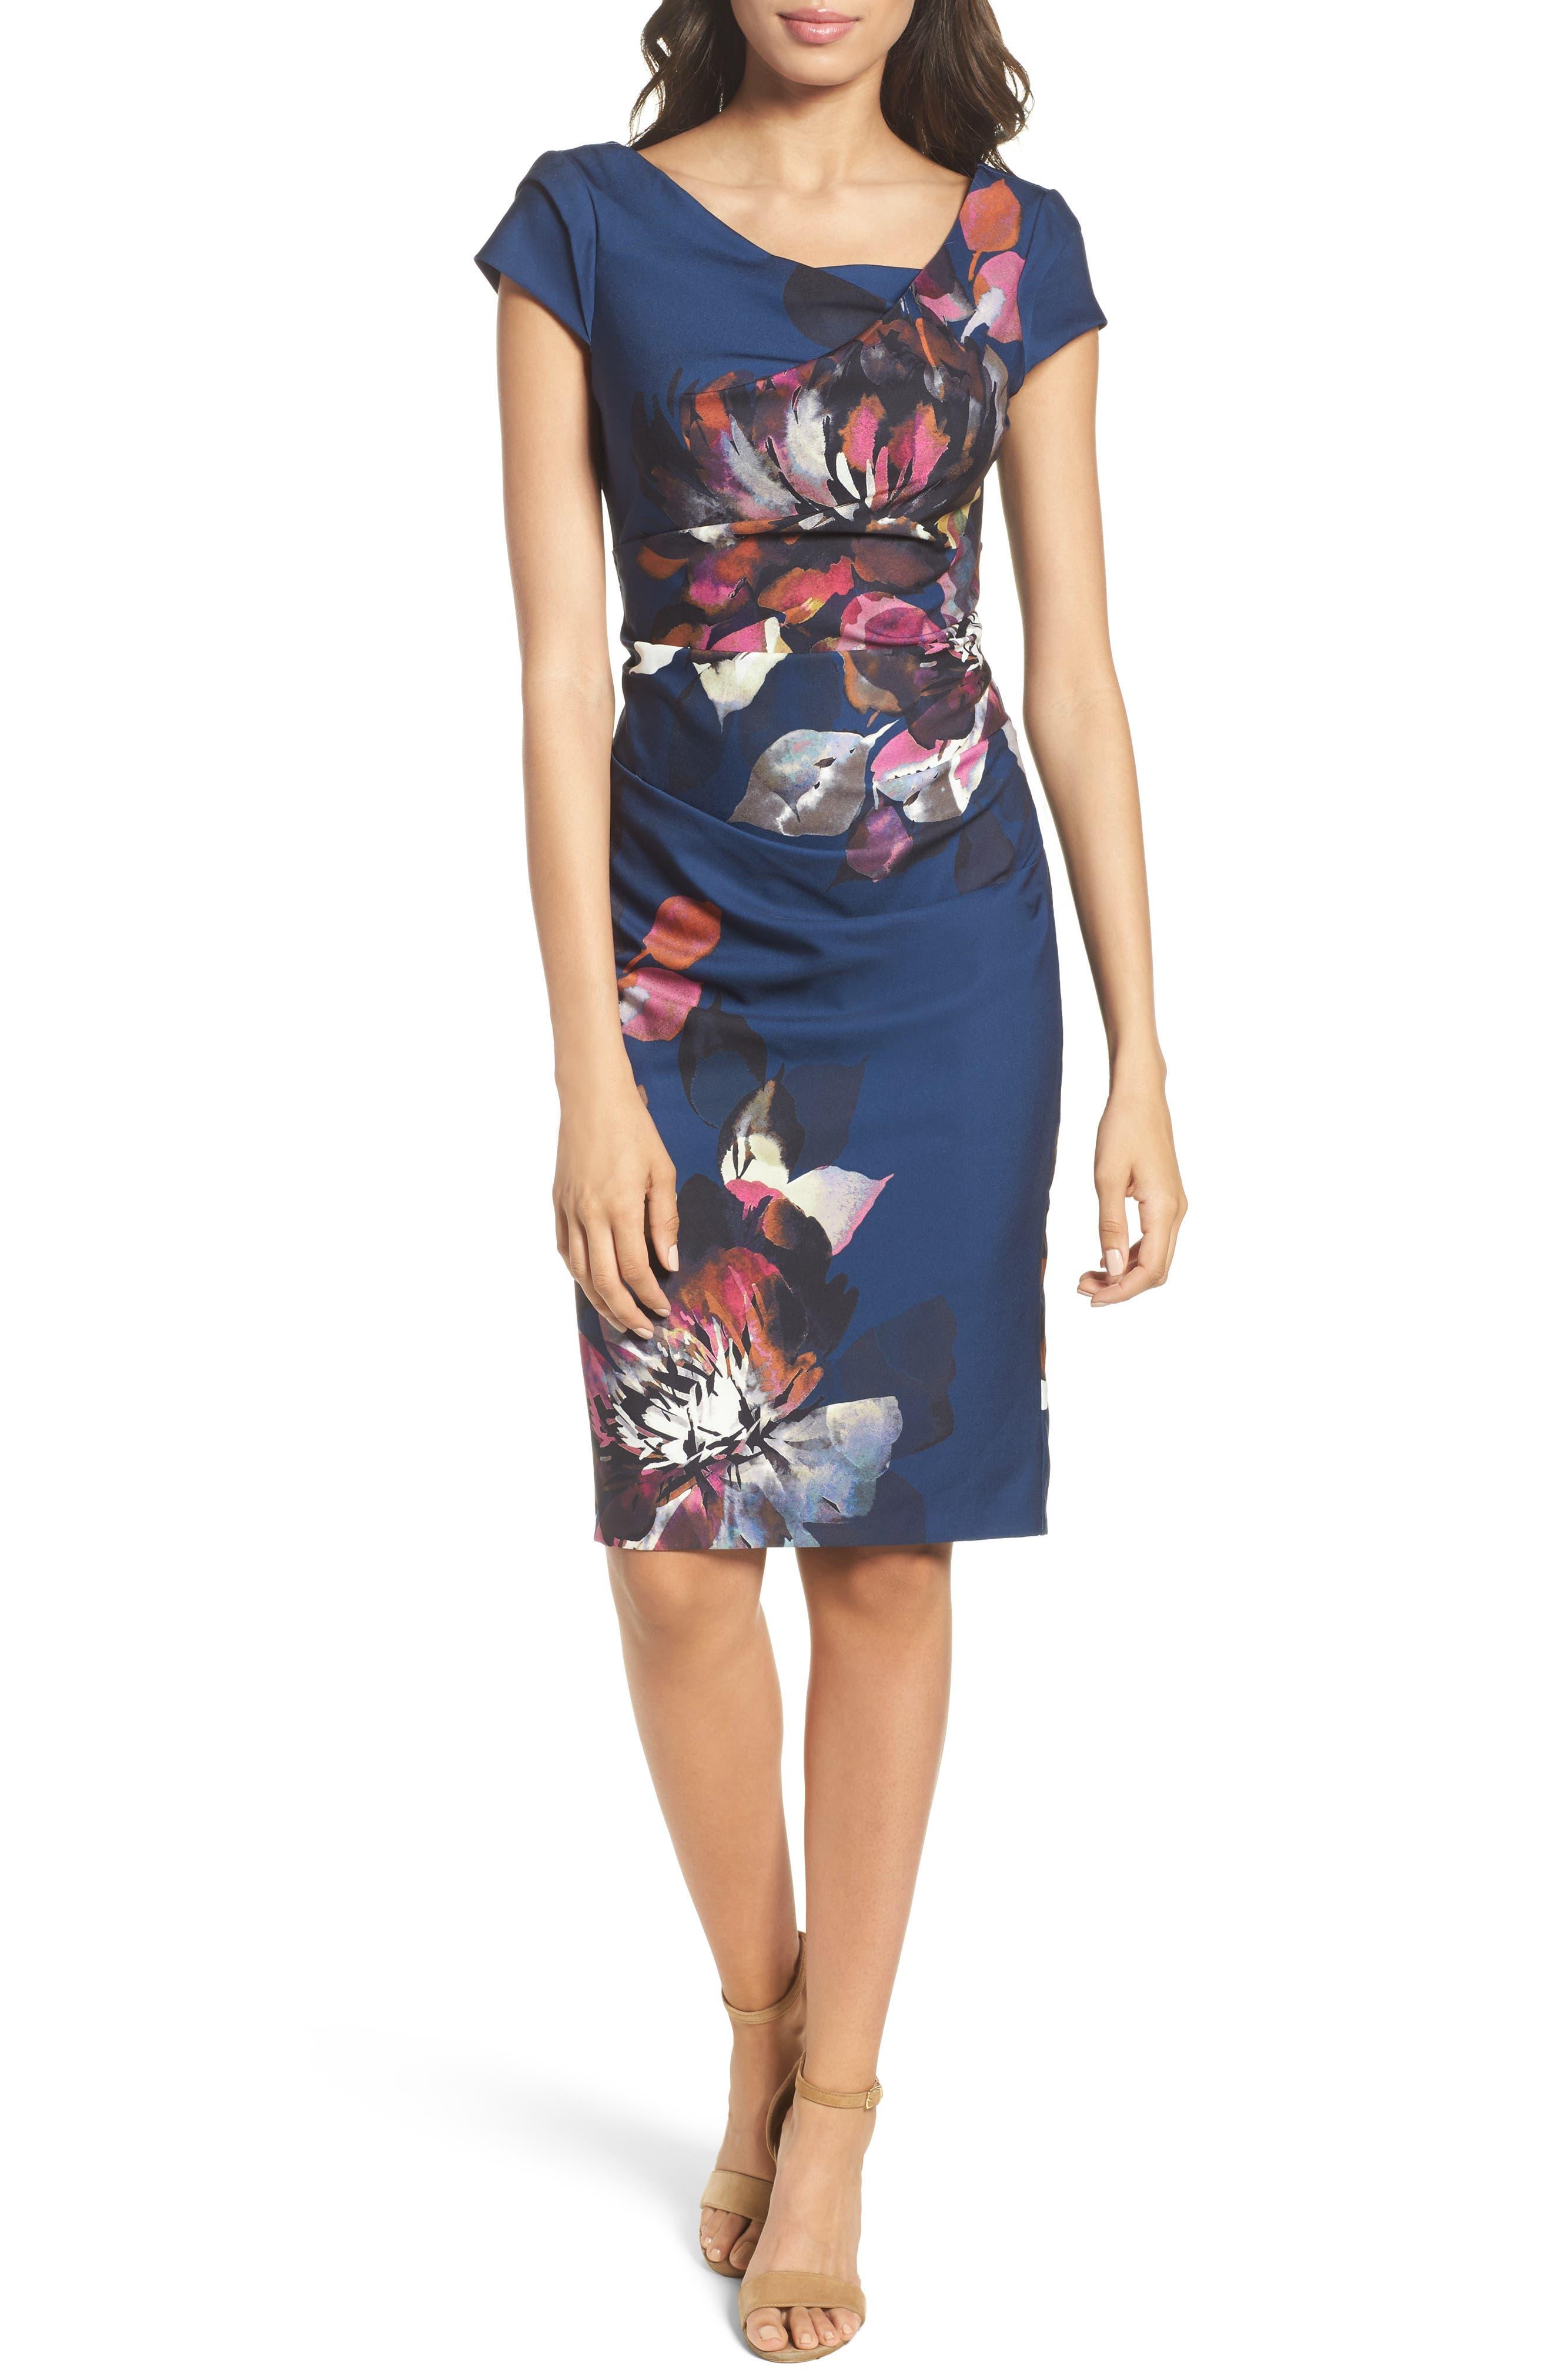 Adrianna Papell Magnolia Cowl Neck Sheath Dress